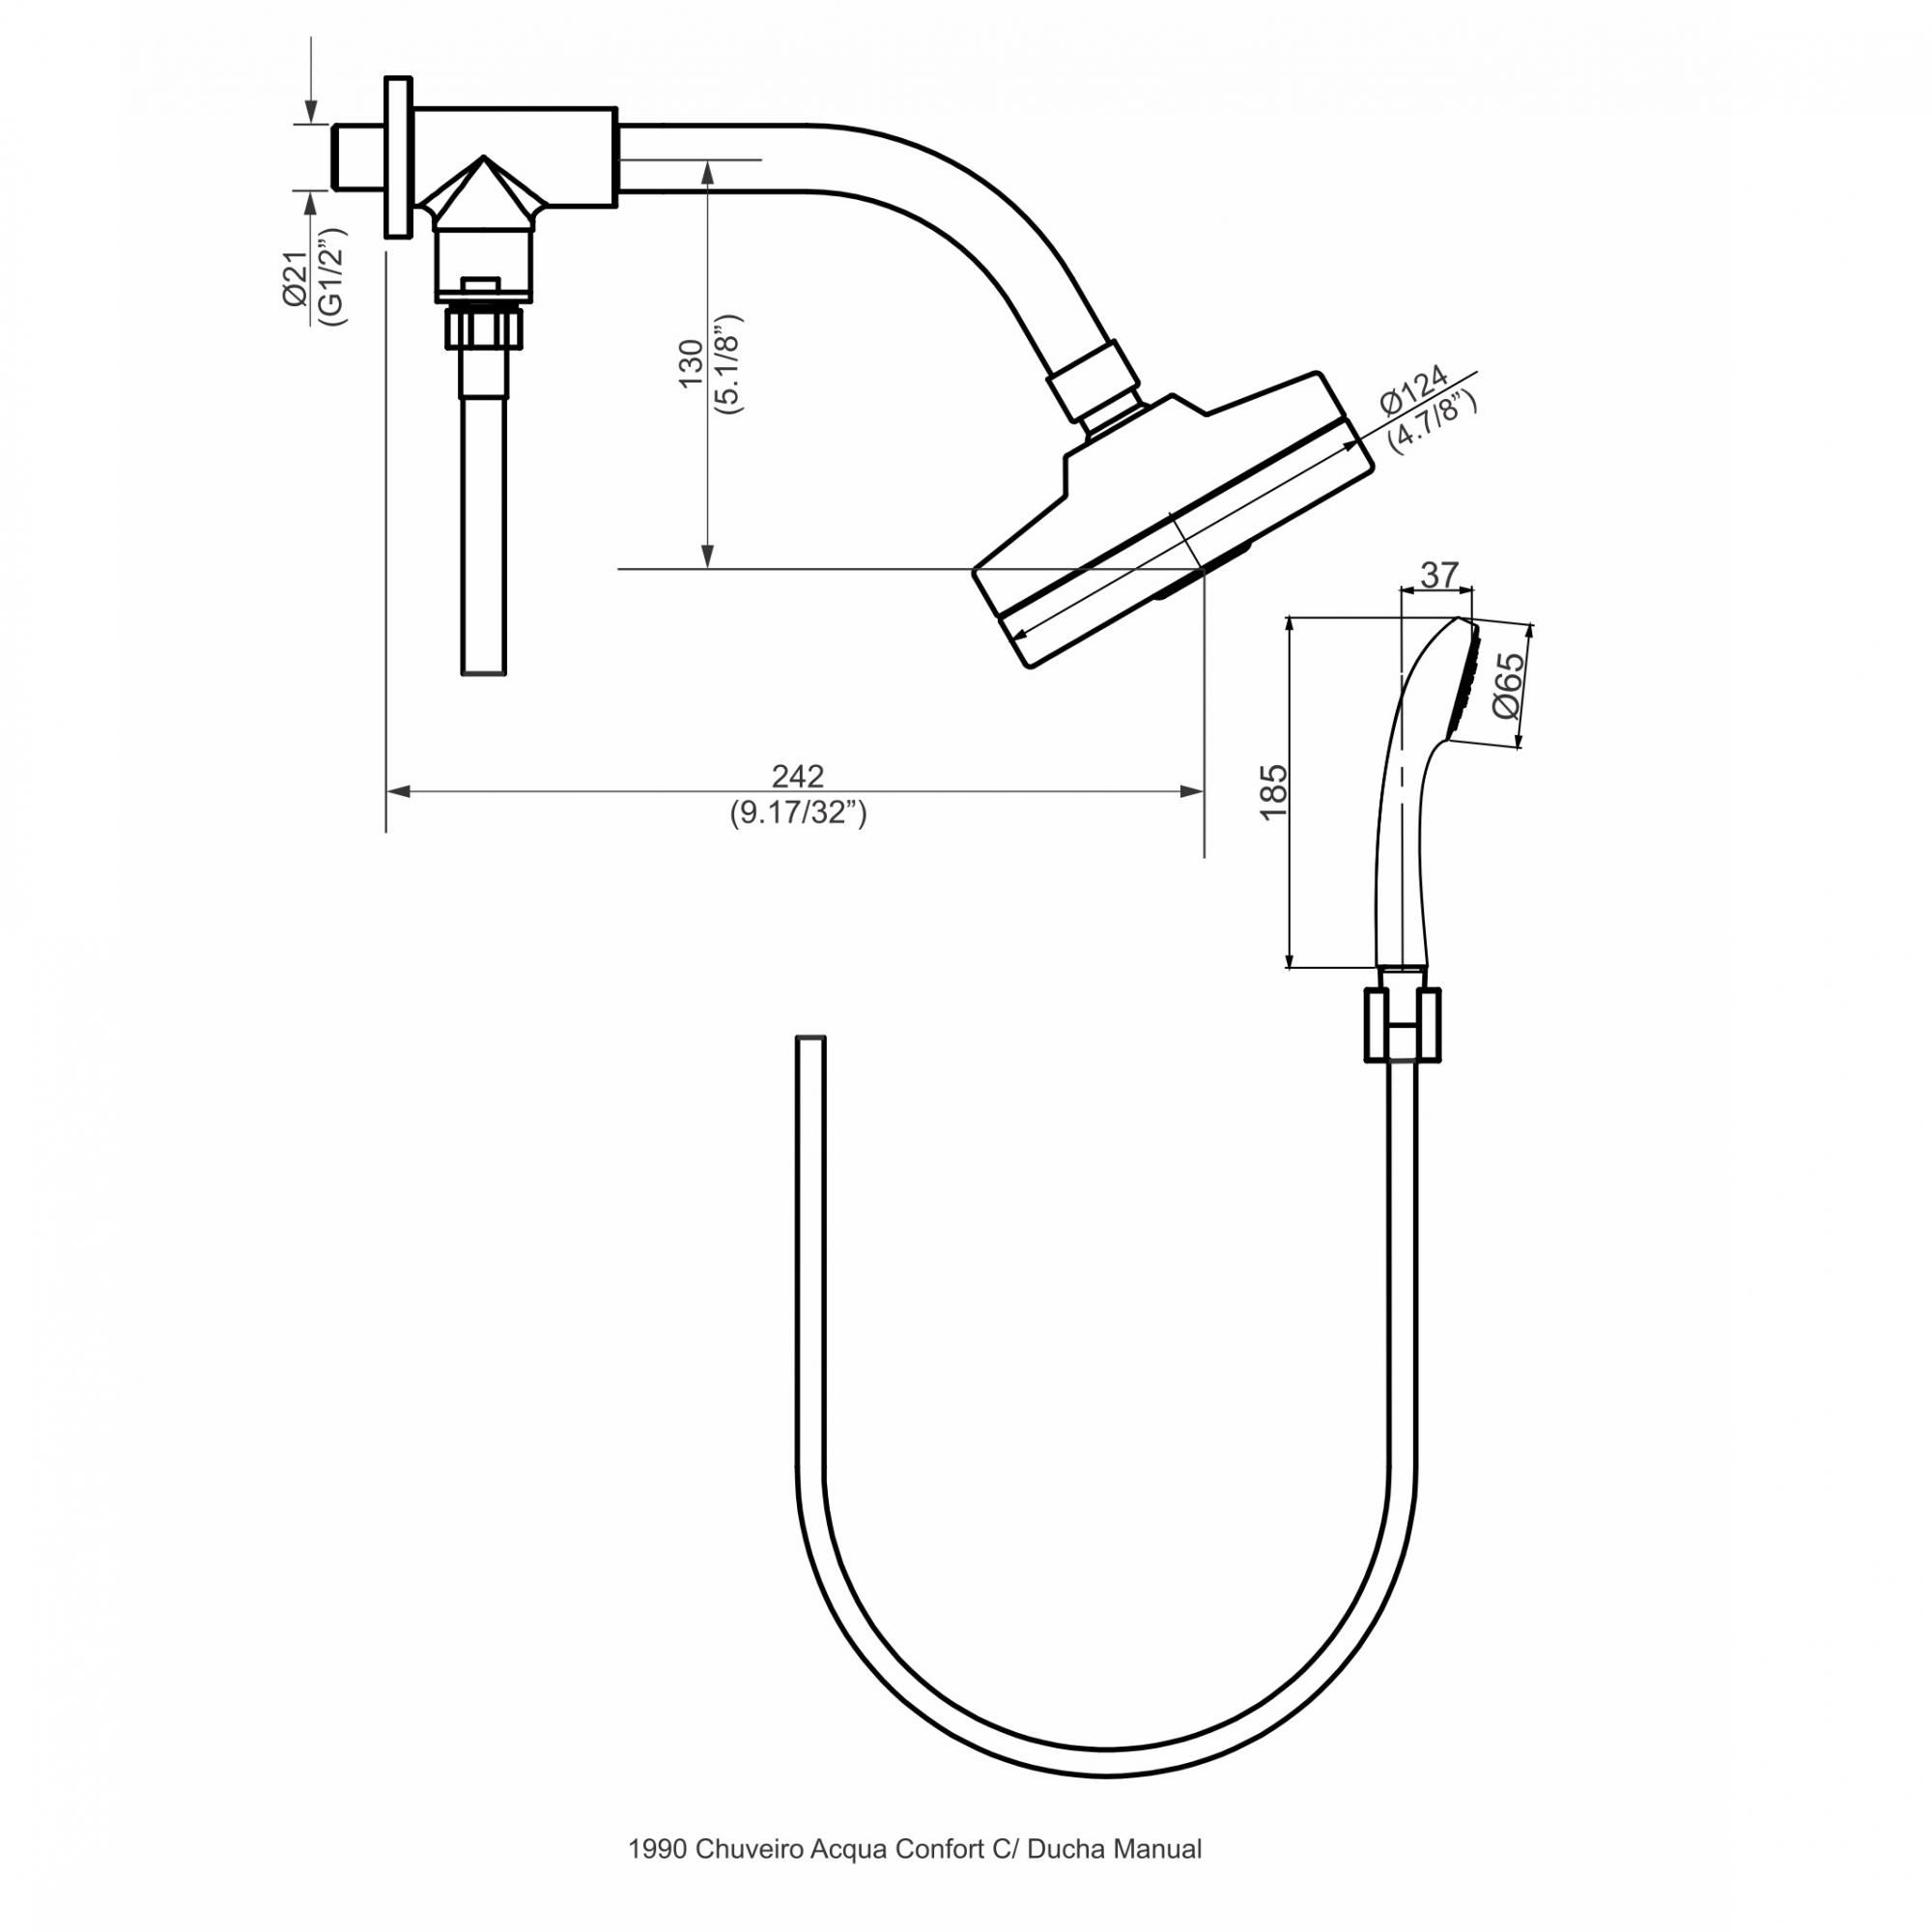 Chuveiro Acqua Comfort Com Ducha Manual 1990